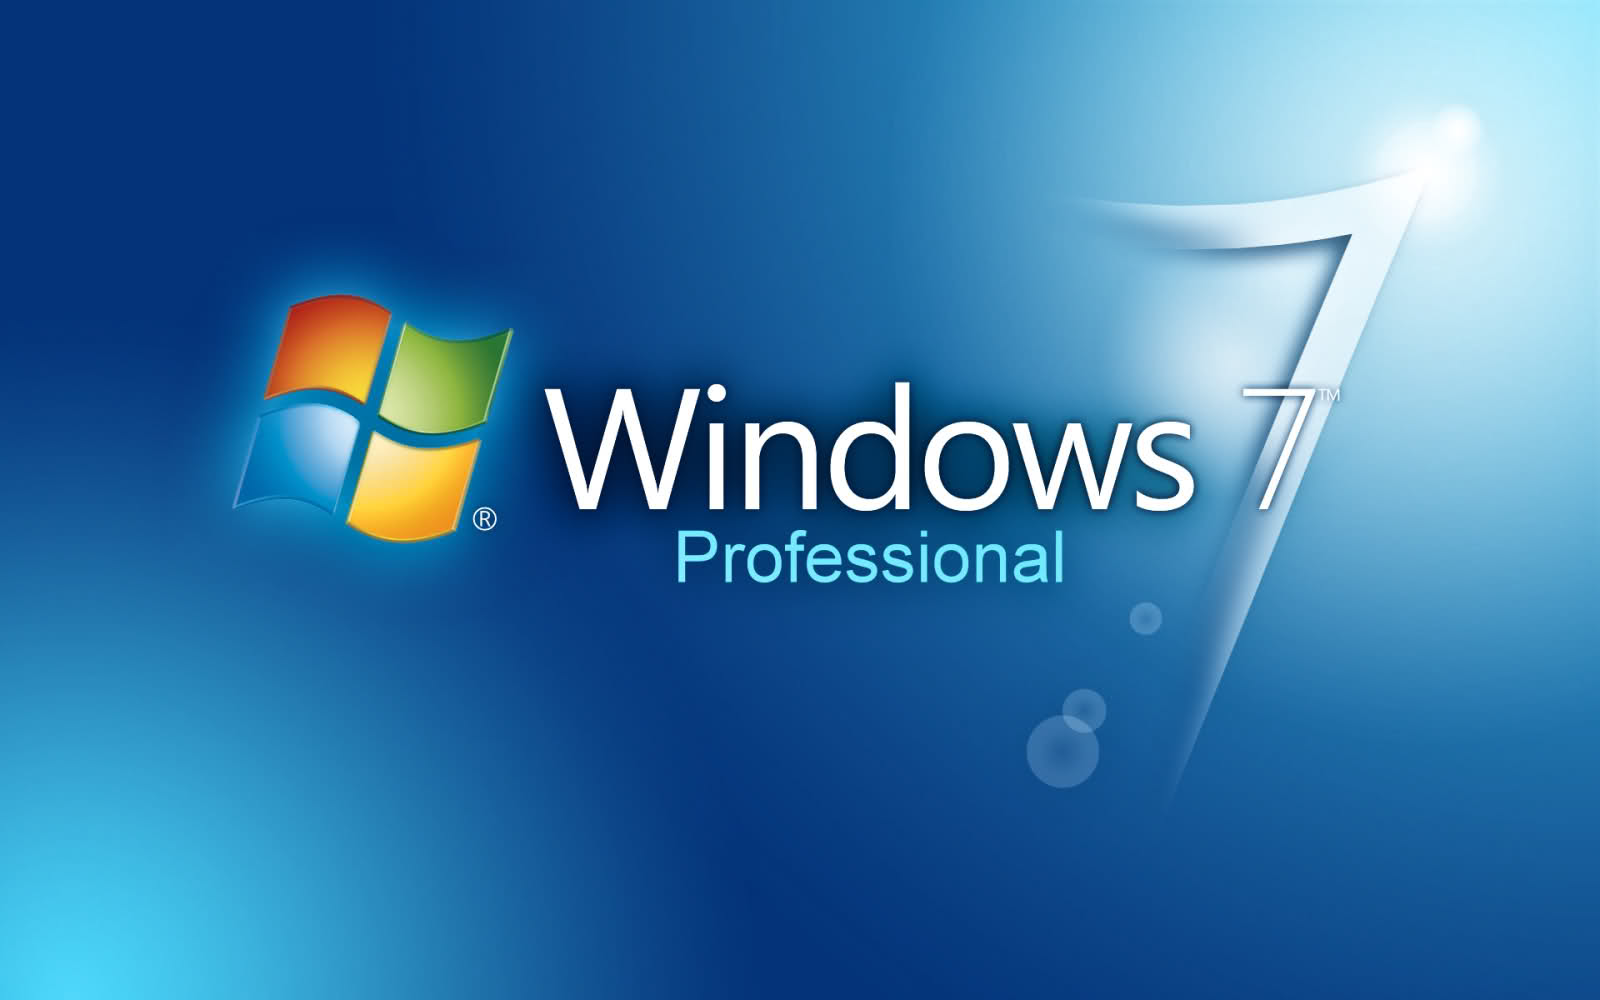 Custom Windows 7 Wallpapers   Page 47   Windows 7 Help Forums 1600x1000